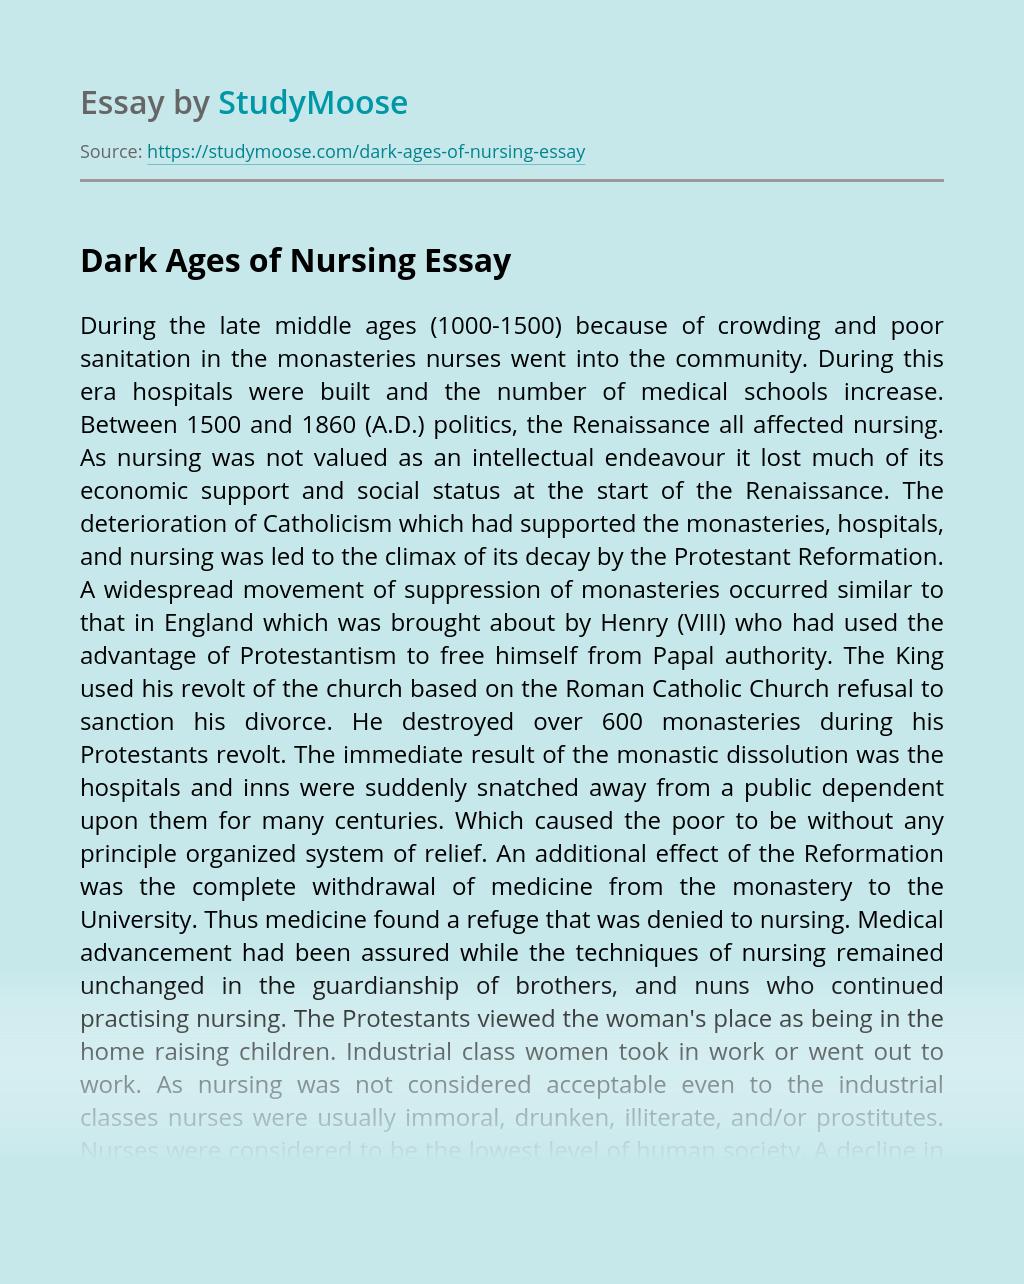 Dark Ages of Nursing